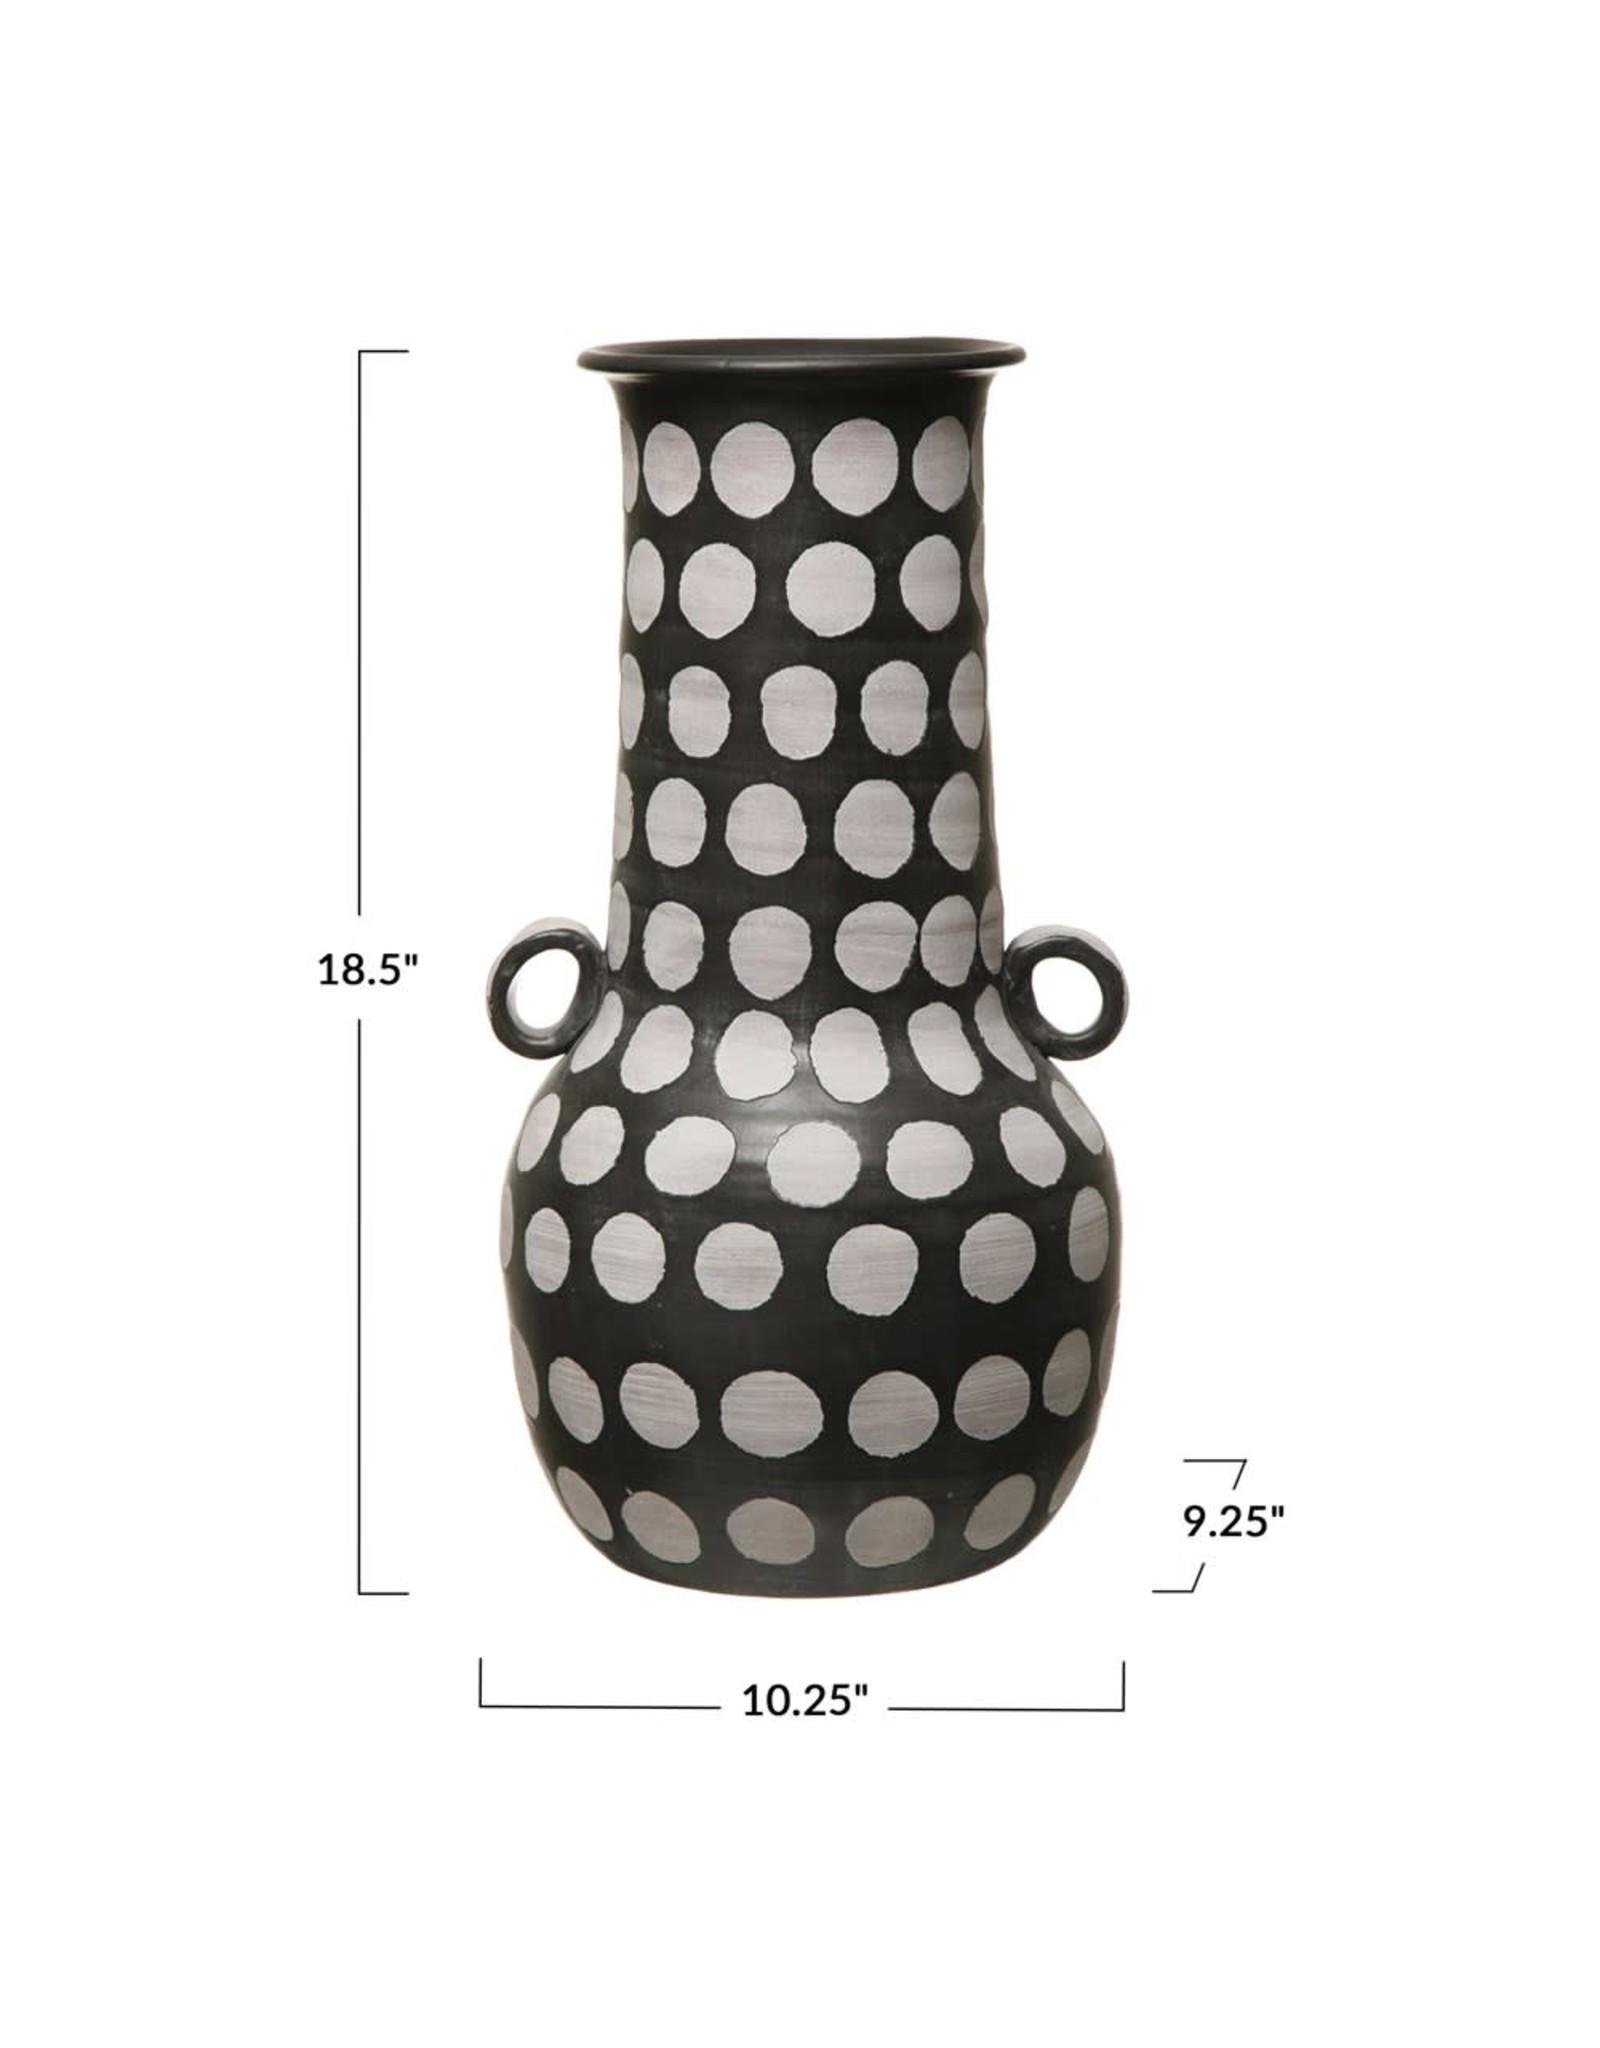 "Creative Co-op 18 1/2"" Hand Painted Terracotta Vase - B&W"